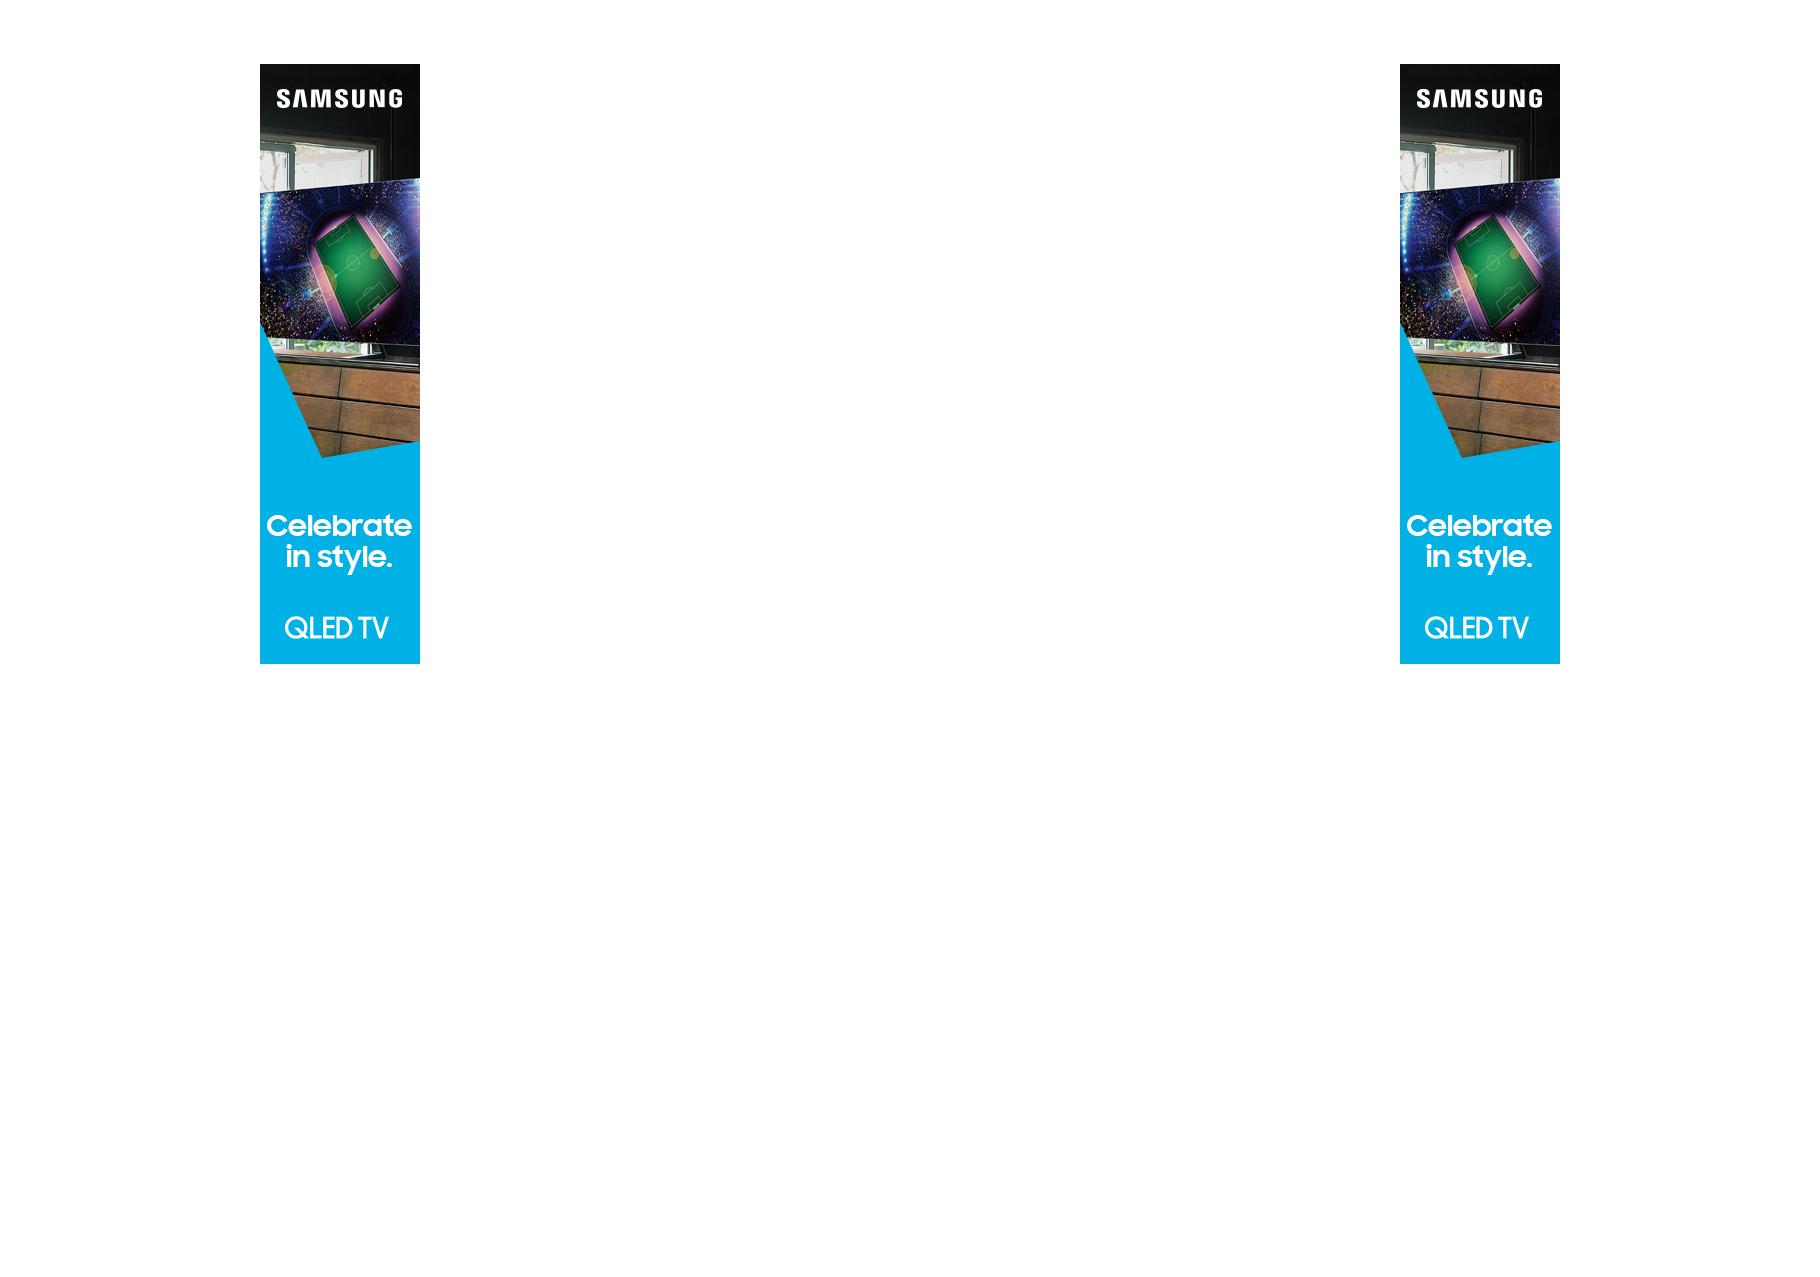 hughes Samsung takeover